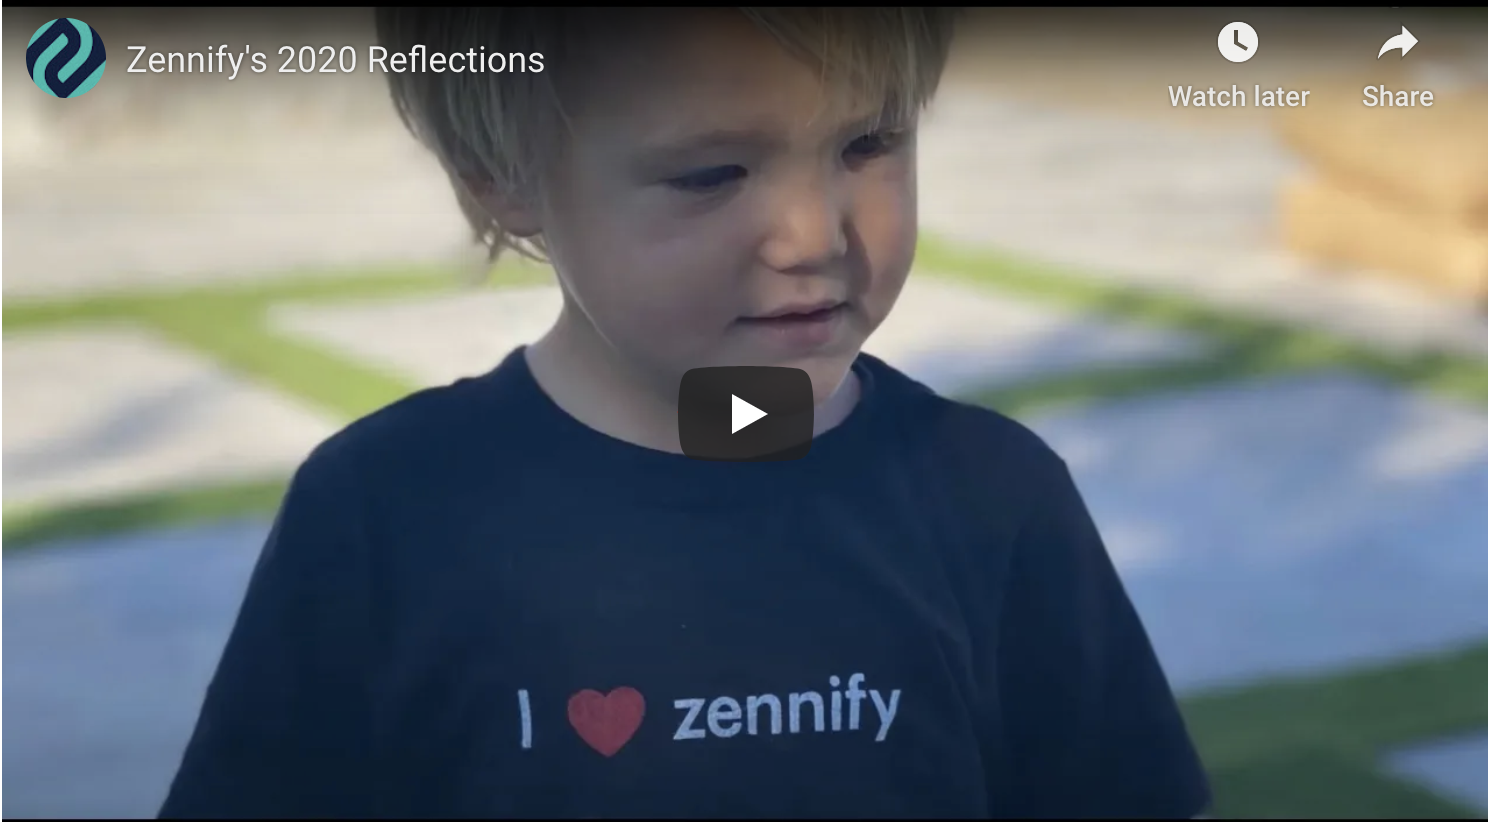 Zennify's 2020 Reflections